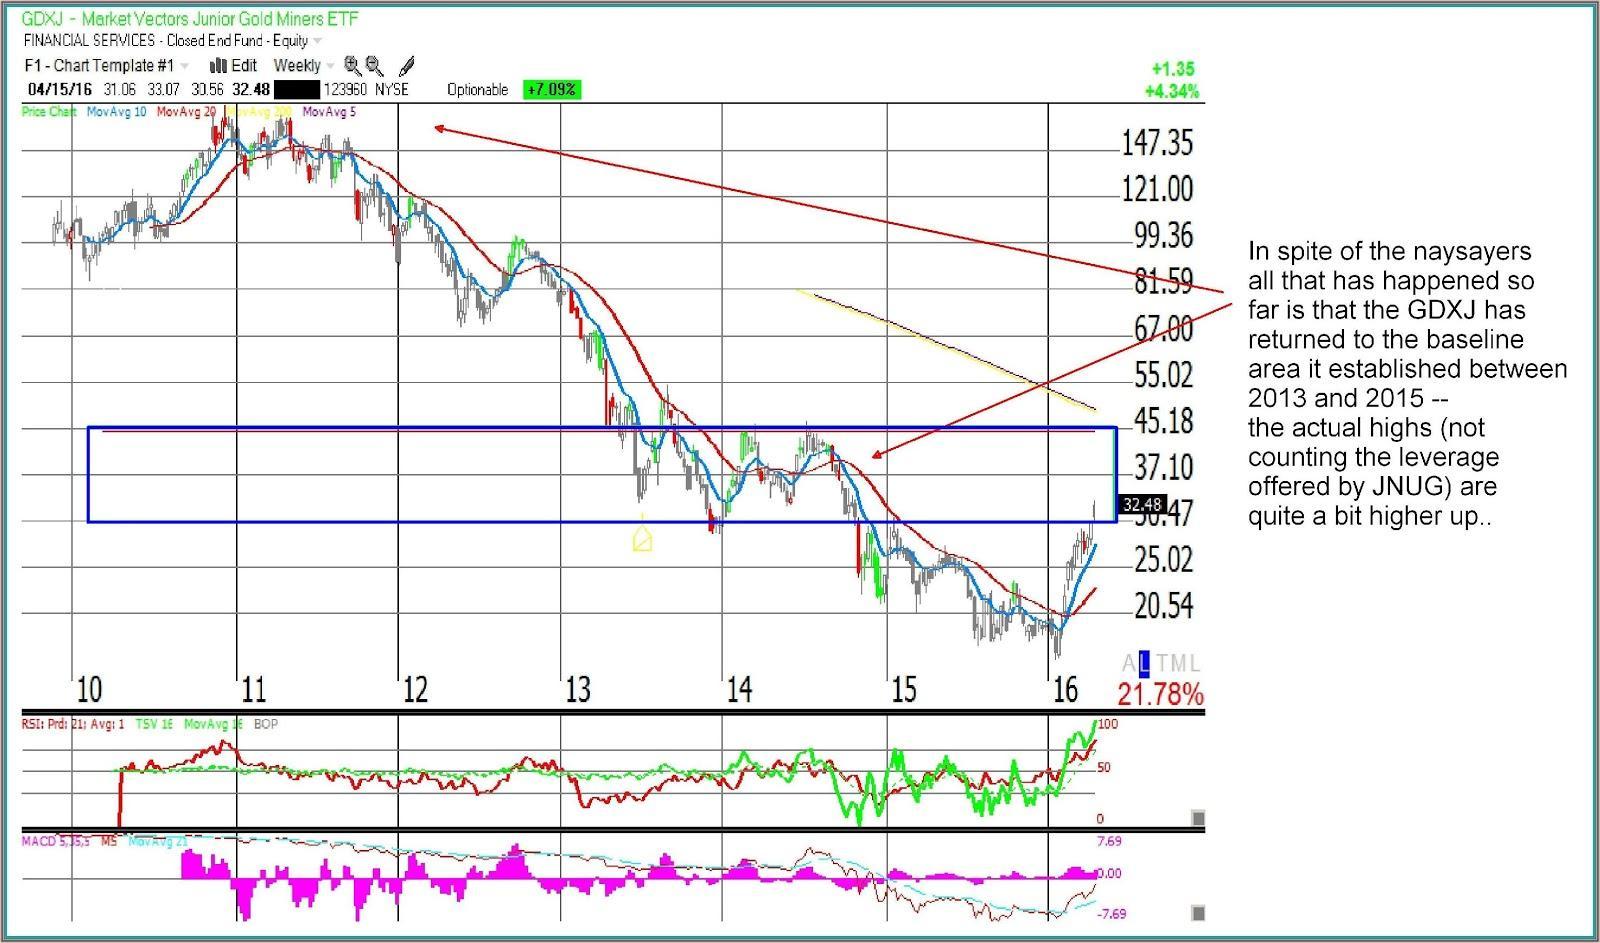 Market Vectors Junior Gold Miners ETF